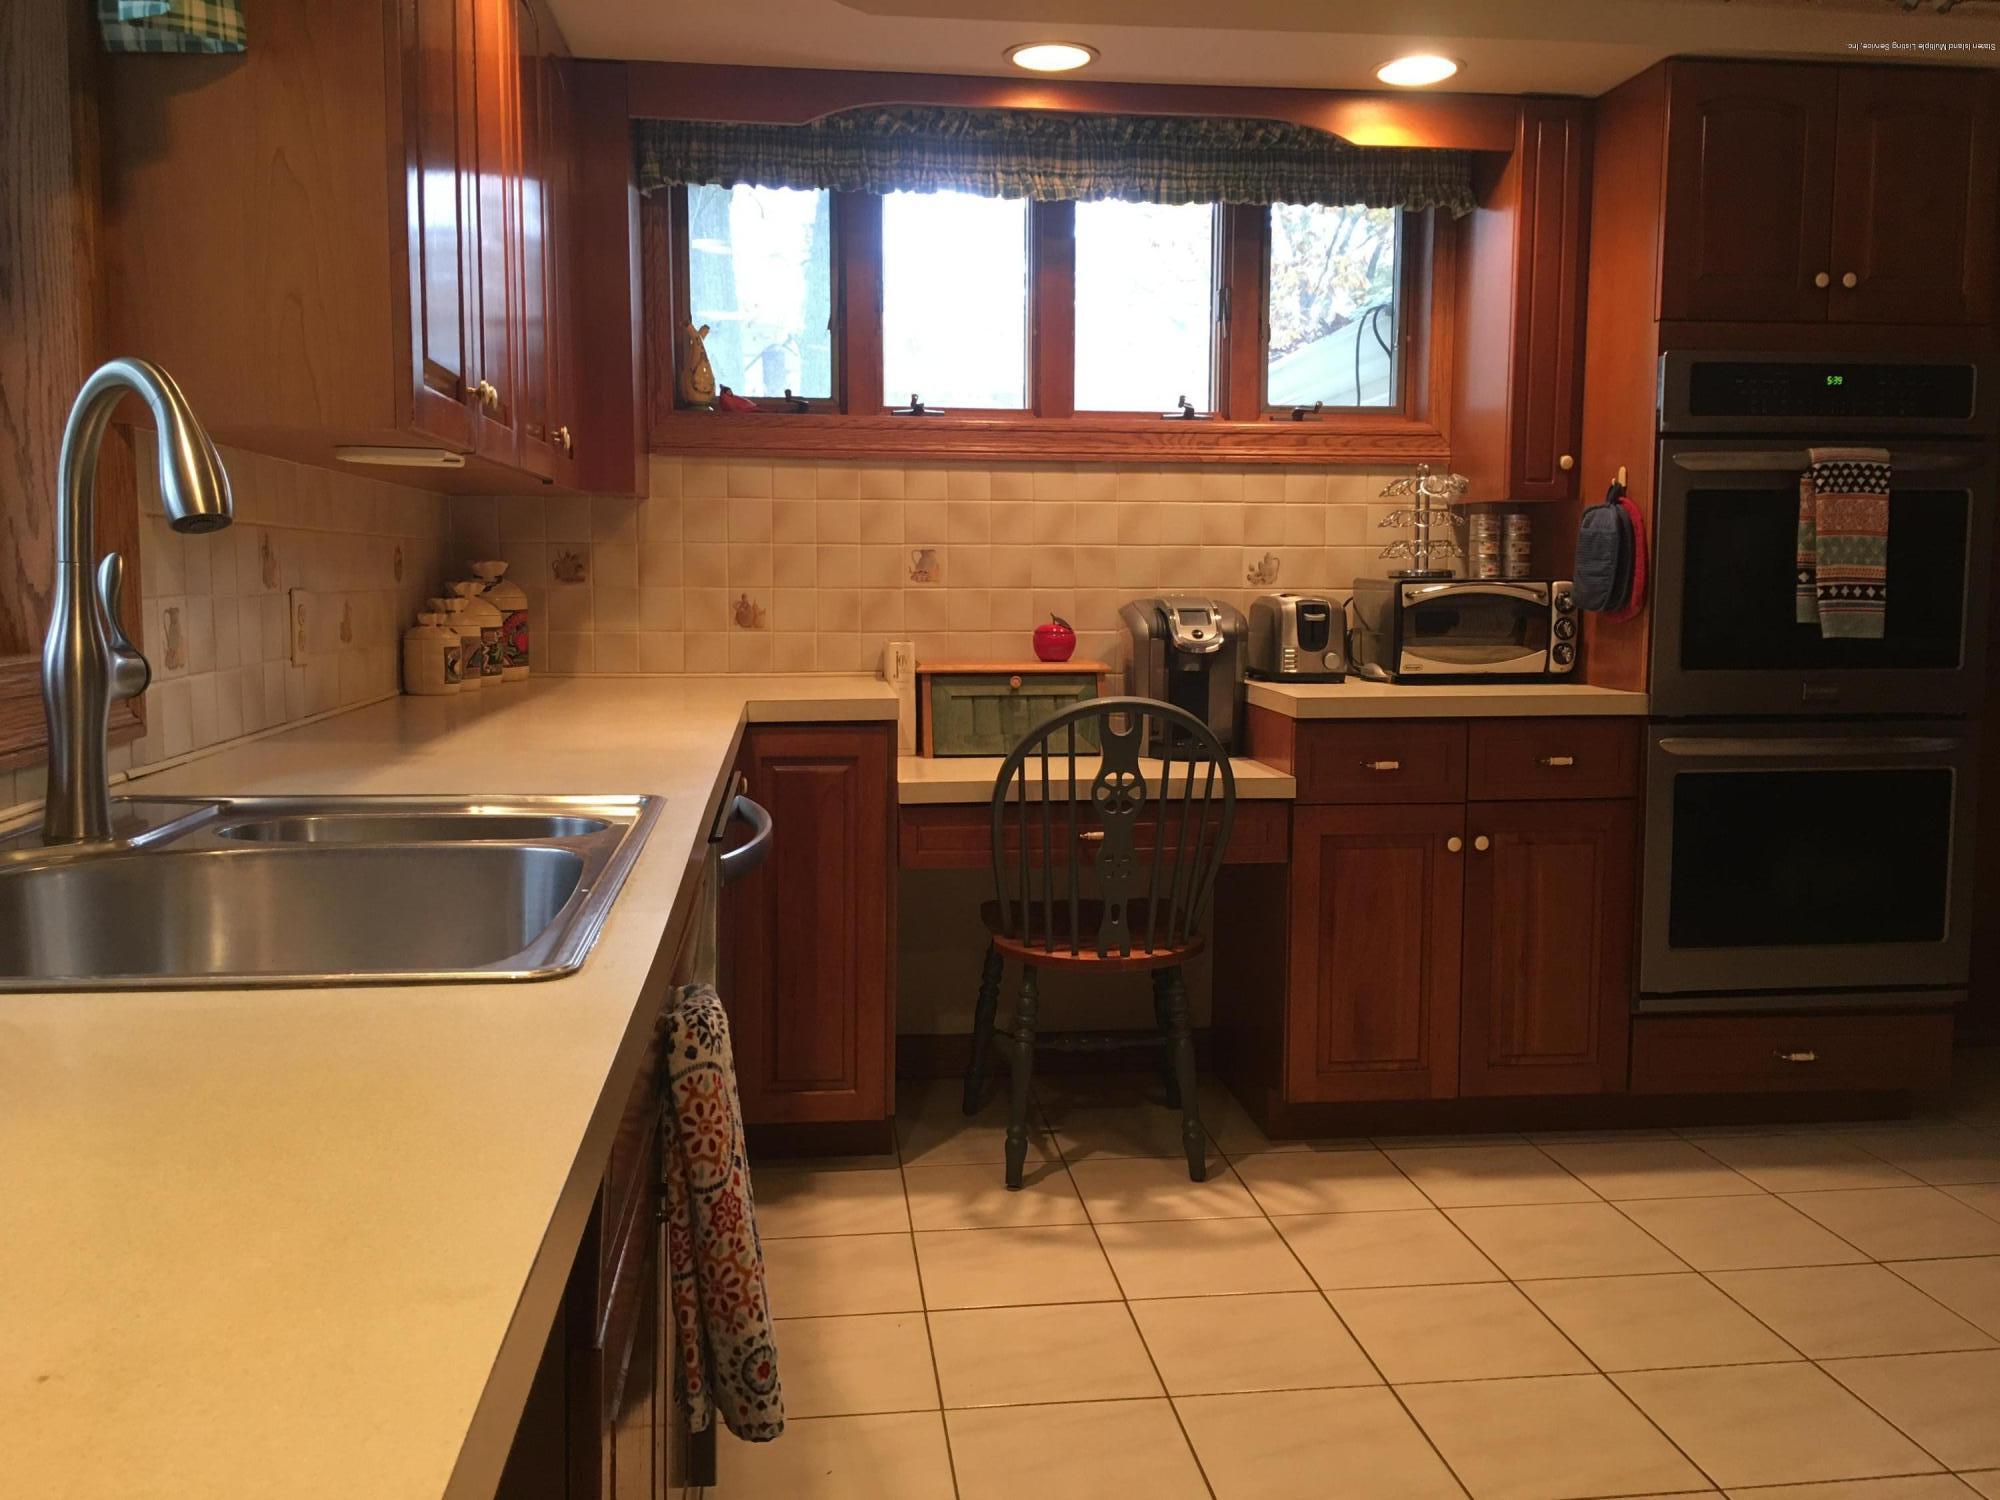 Single Family - Detached 731 Metropolitan Avenue  Staten Island, NY 10301, MLS-1134021-19